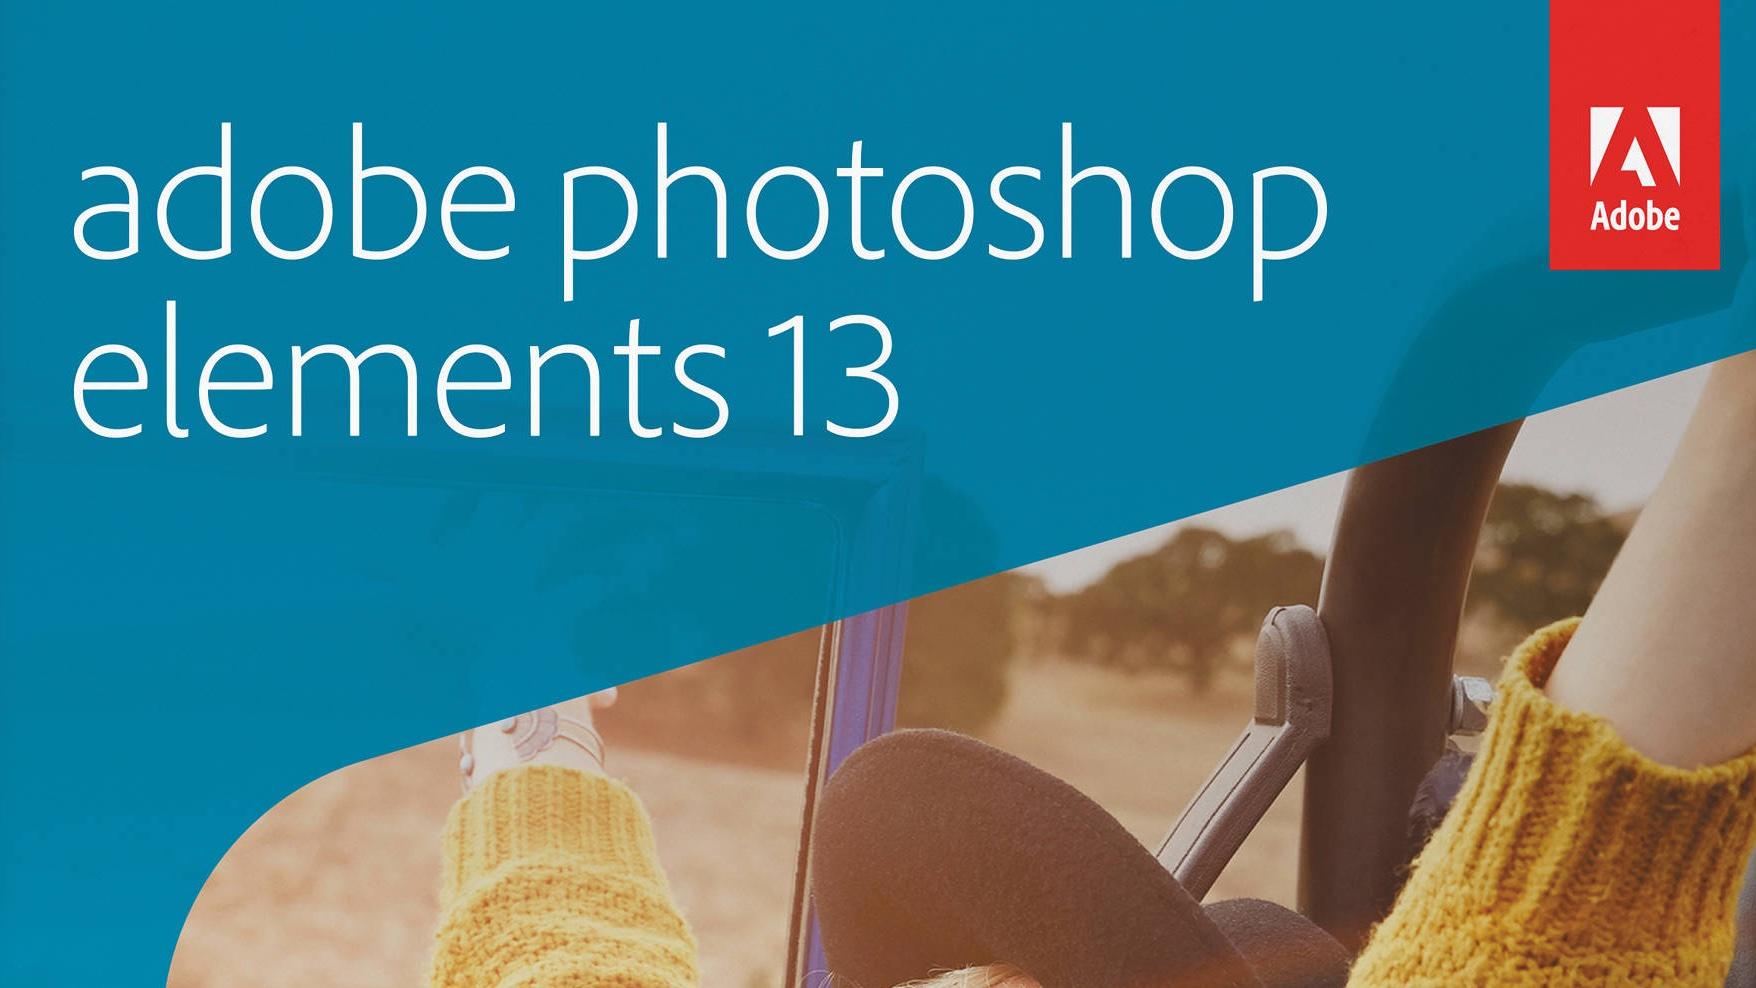 adobe-photoshop-elements-13